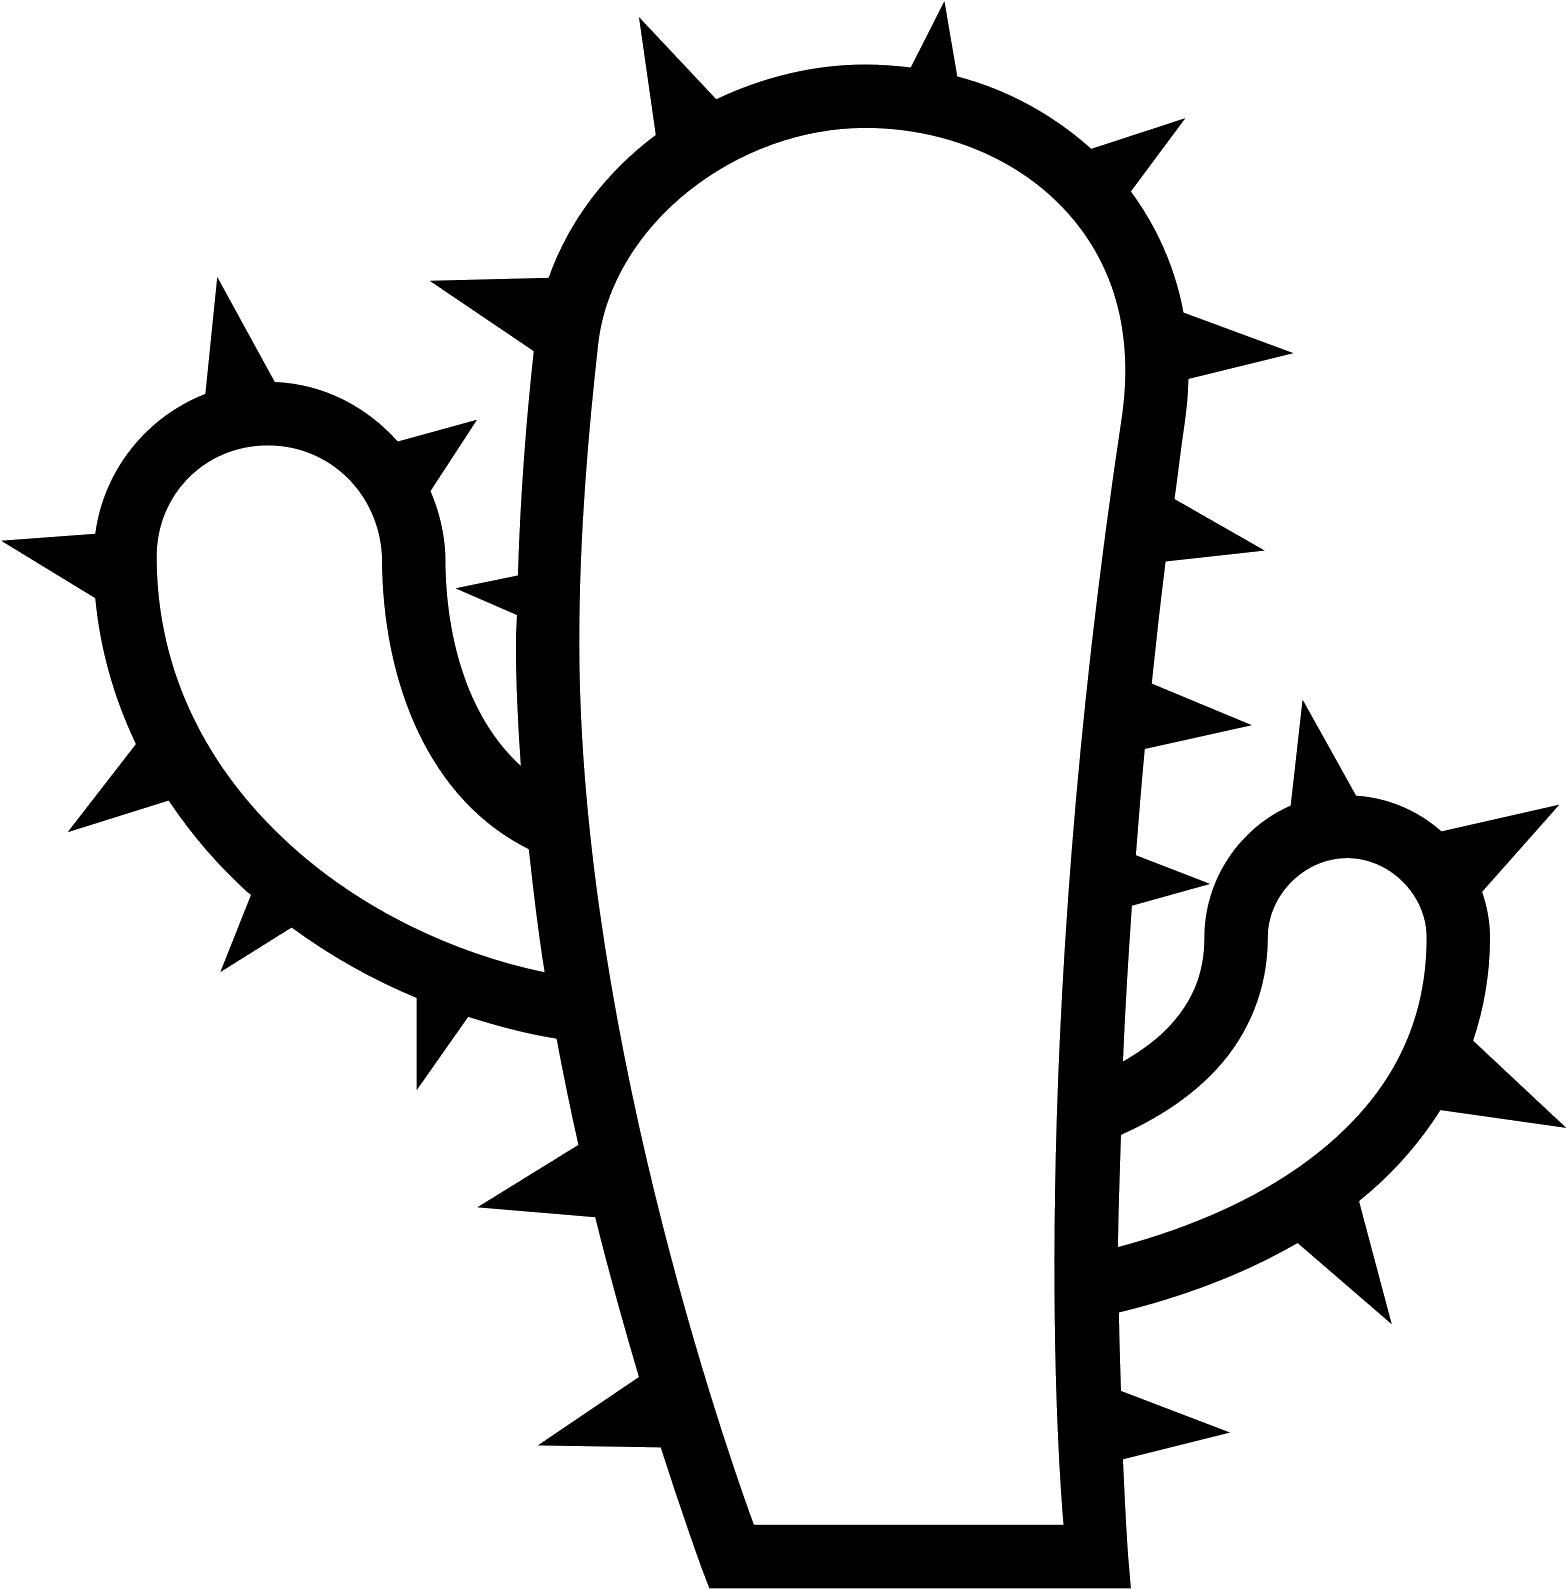 Cactus black. Clipart icon png transparent